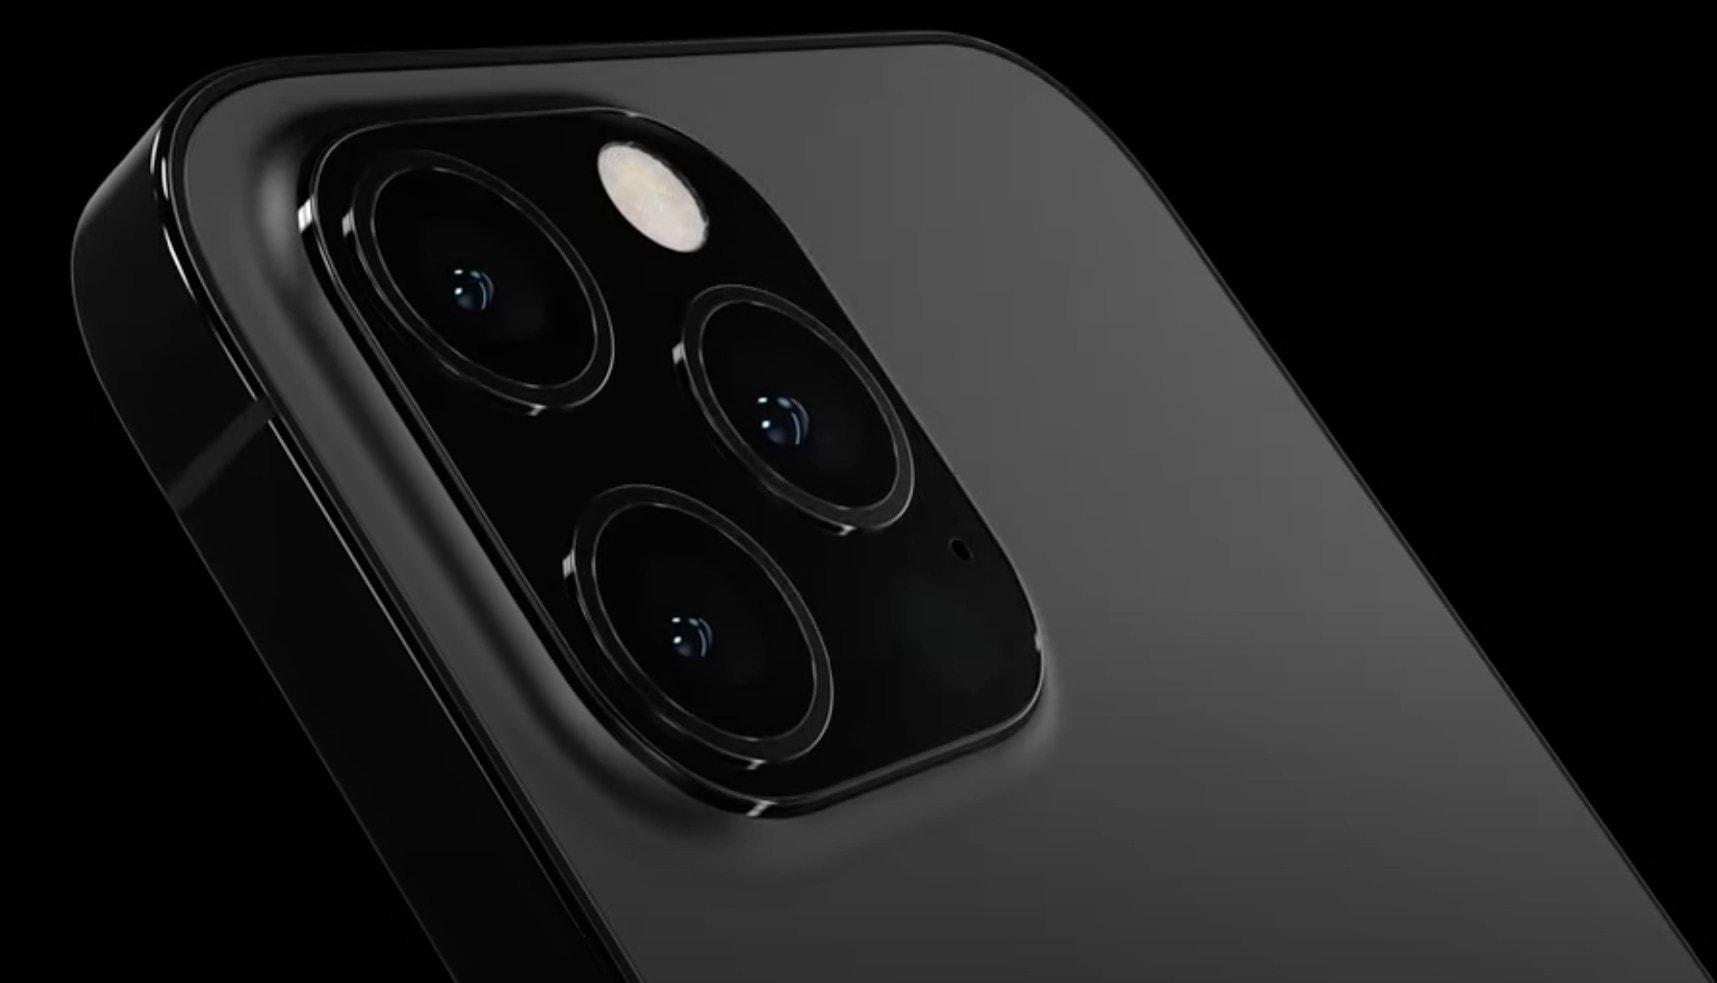 iPhone 13 matte black